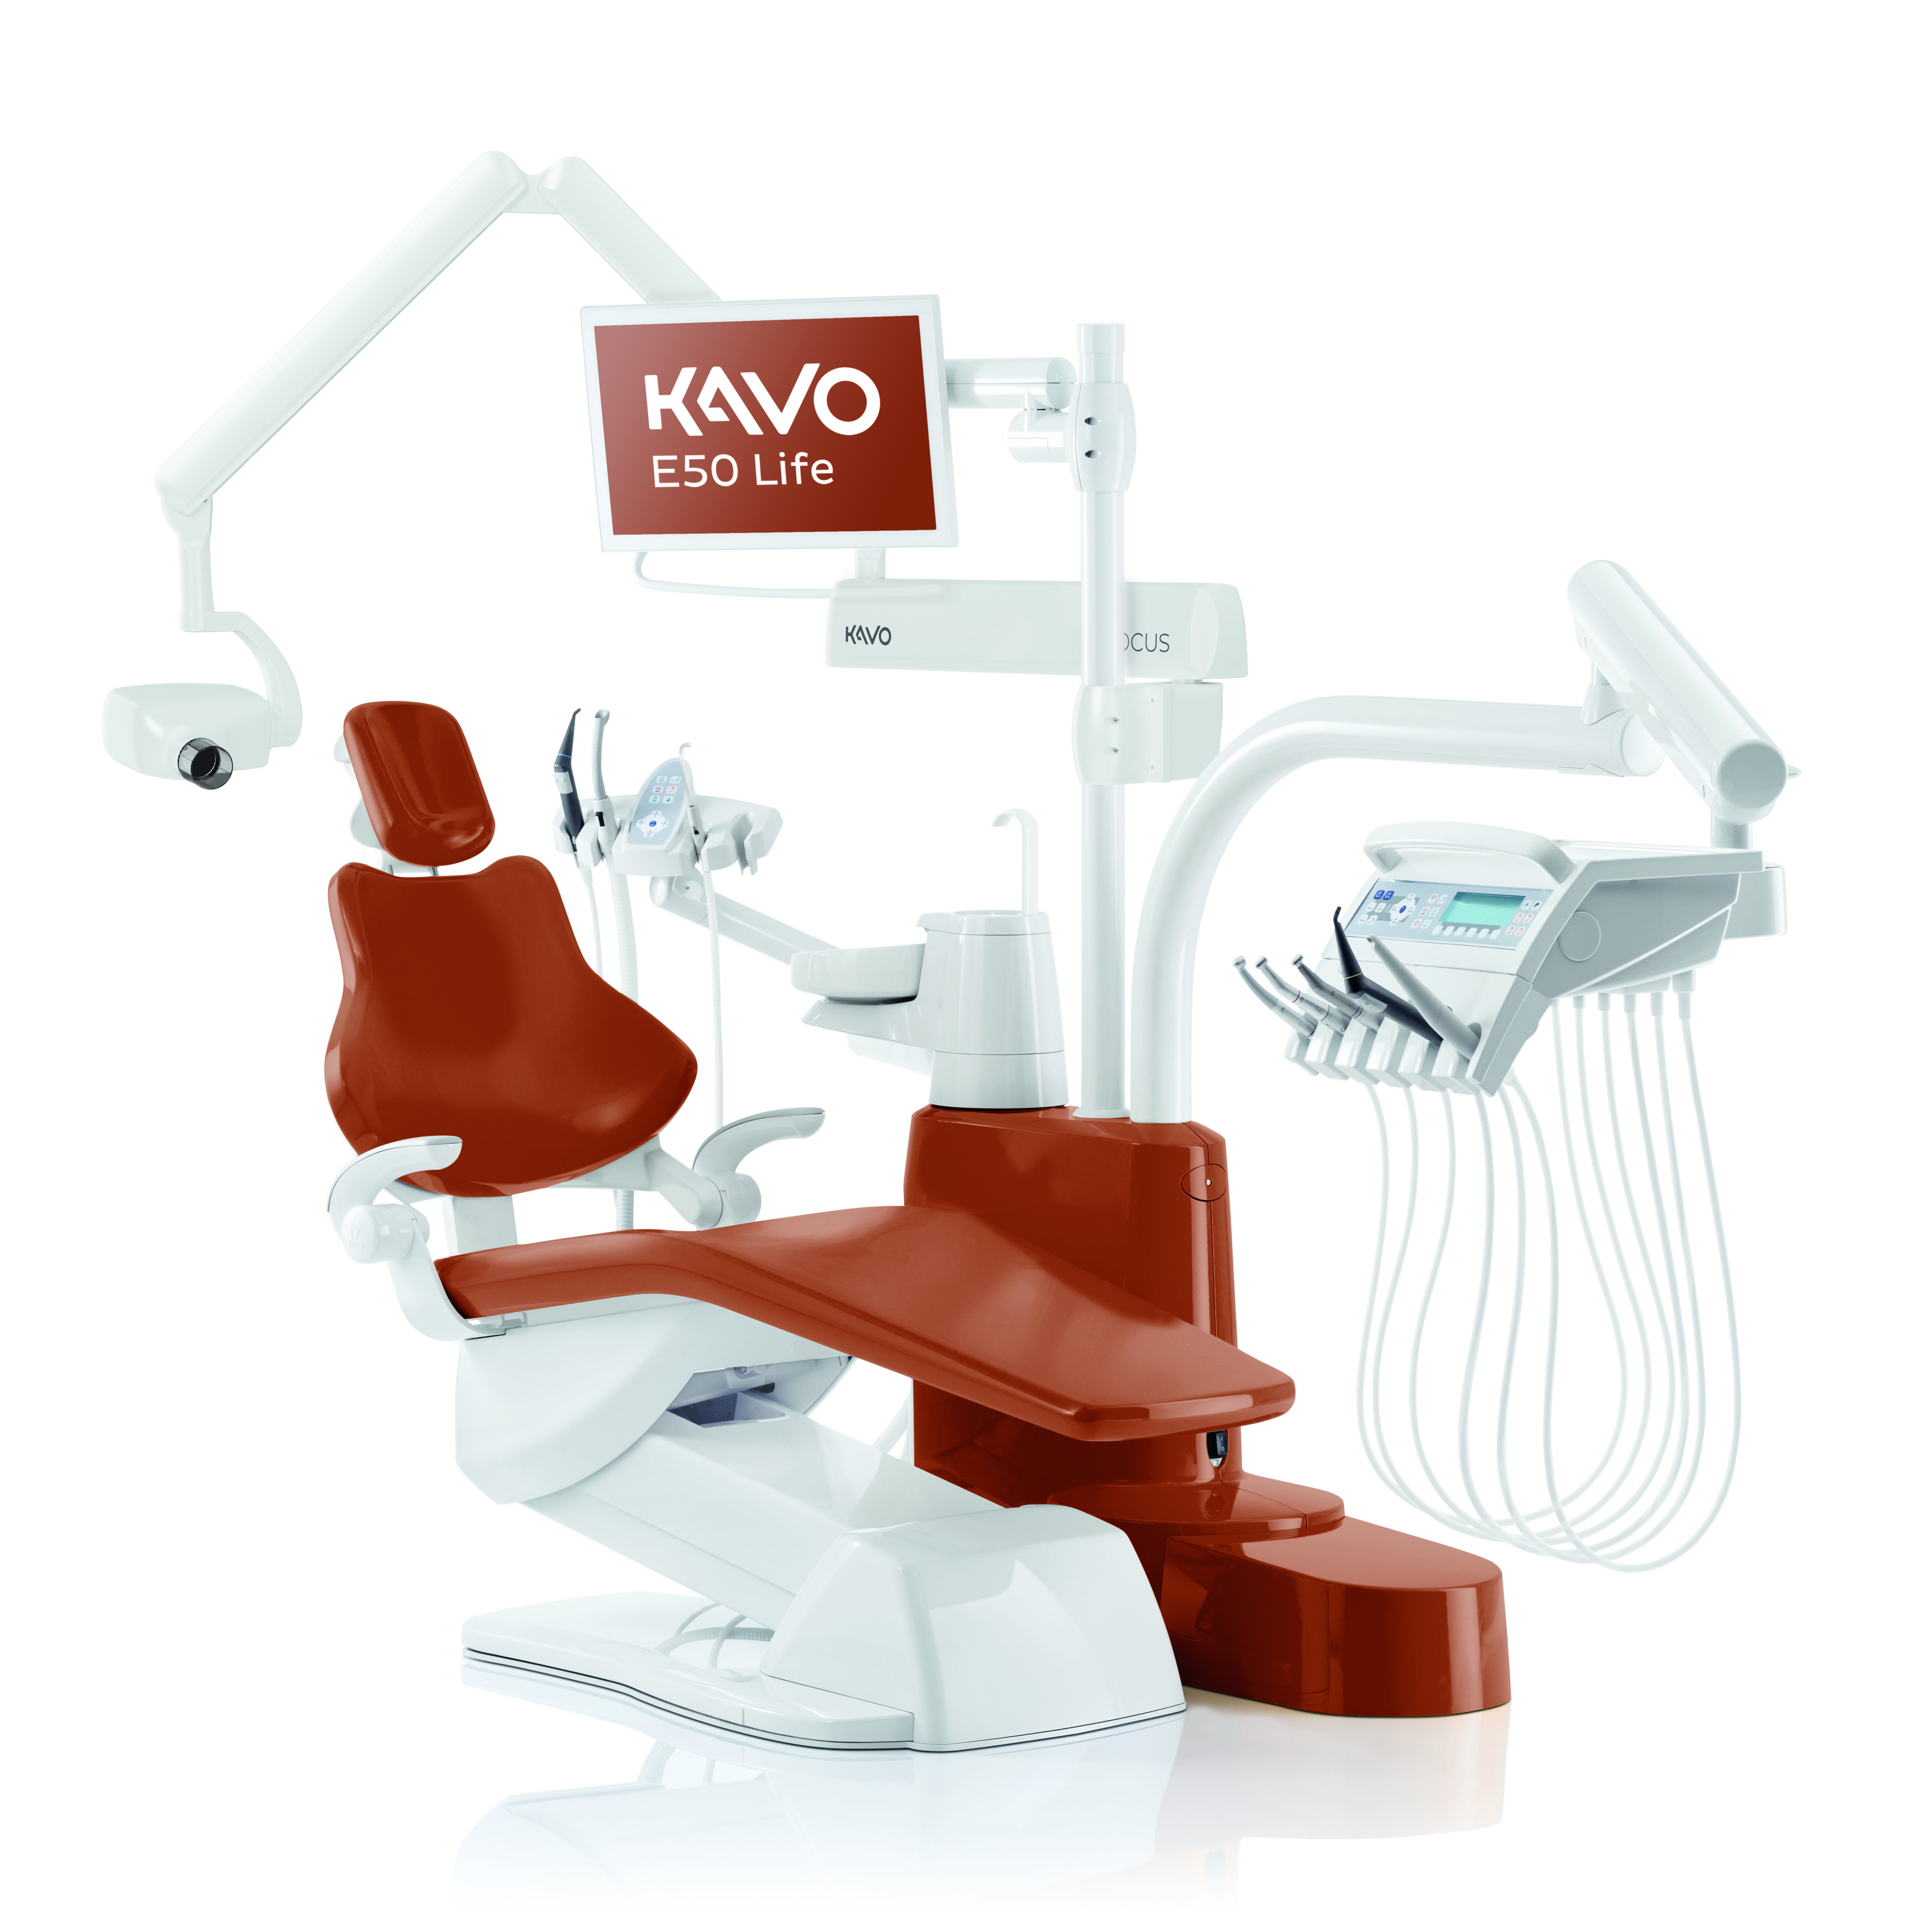 KaVo ESTETICA™ E50 Life